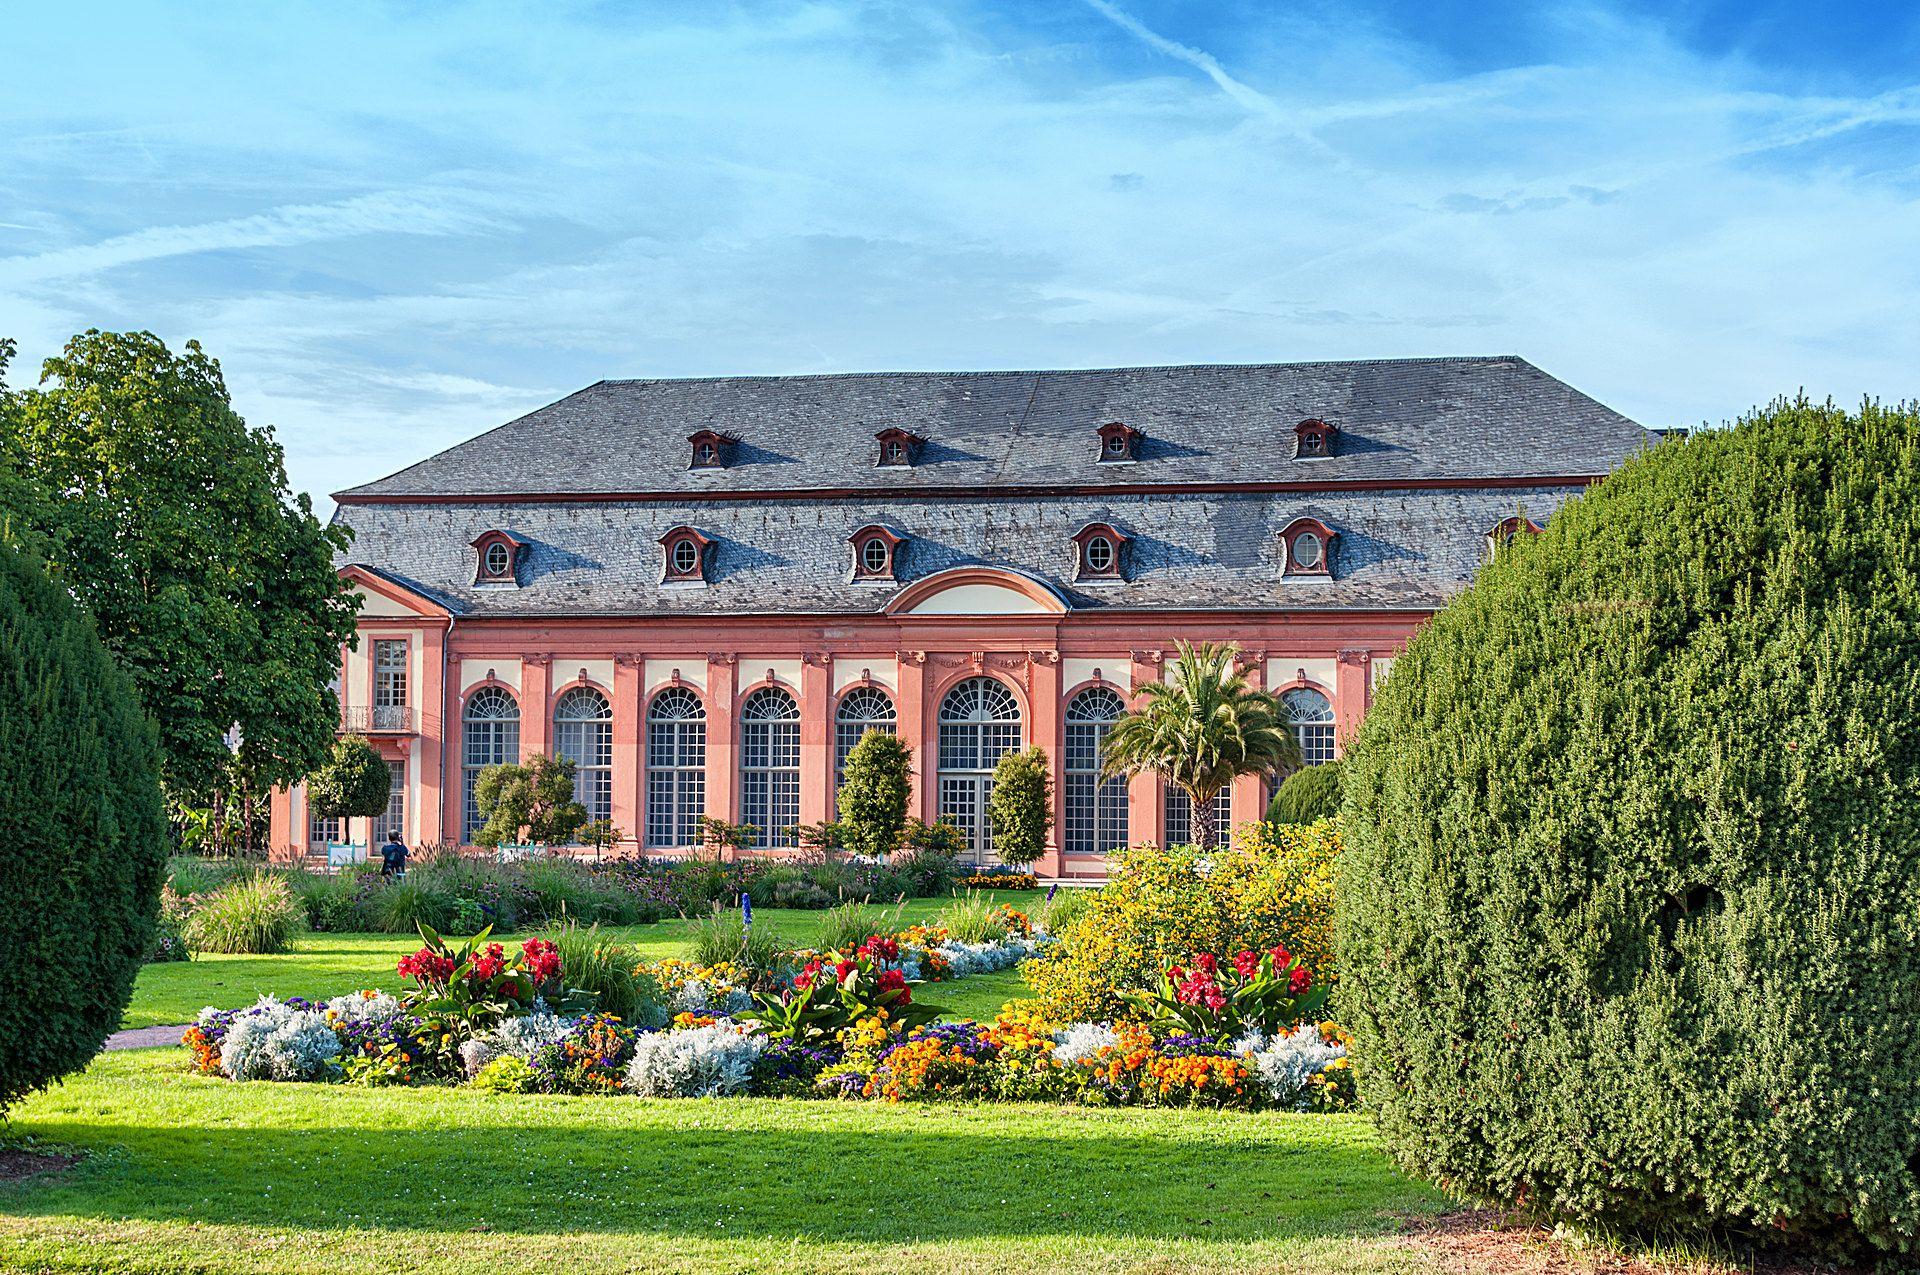 Orangerie In Darmstadt Botanischer Garten In 2021 Botanischer Garten Darmstadt Garten